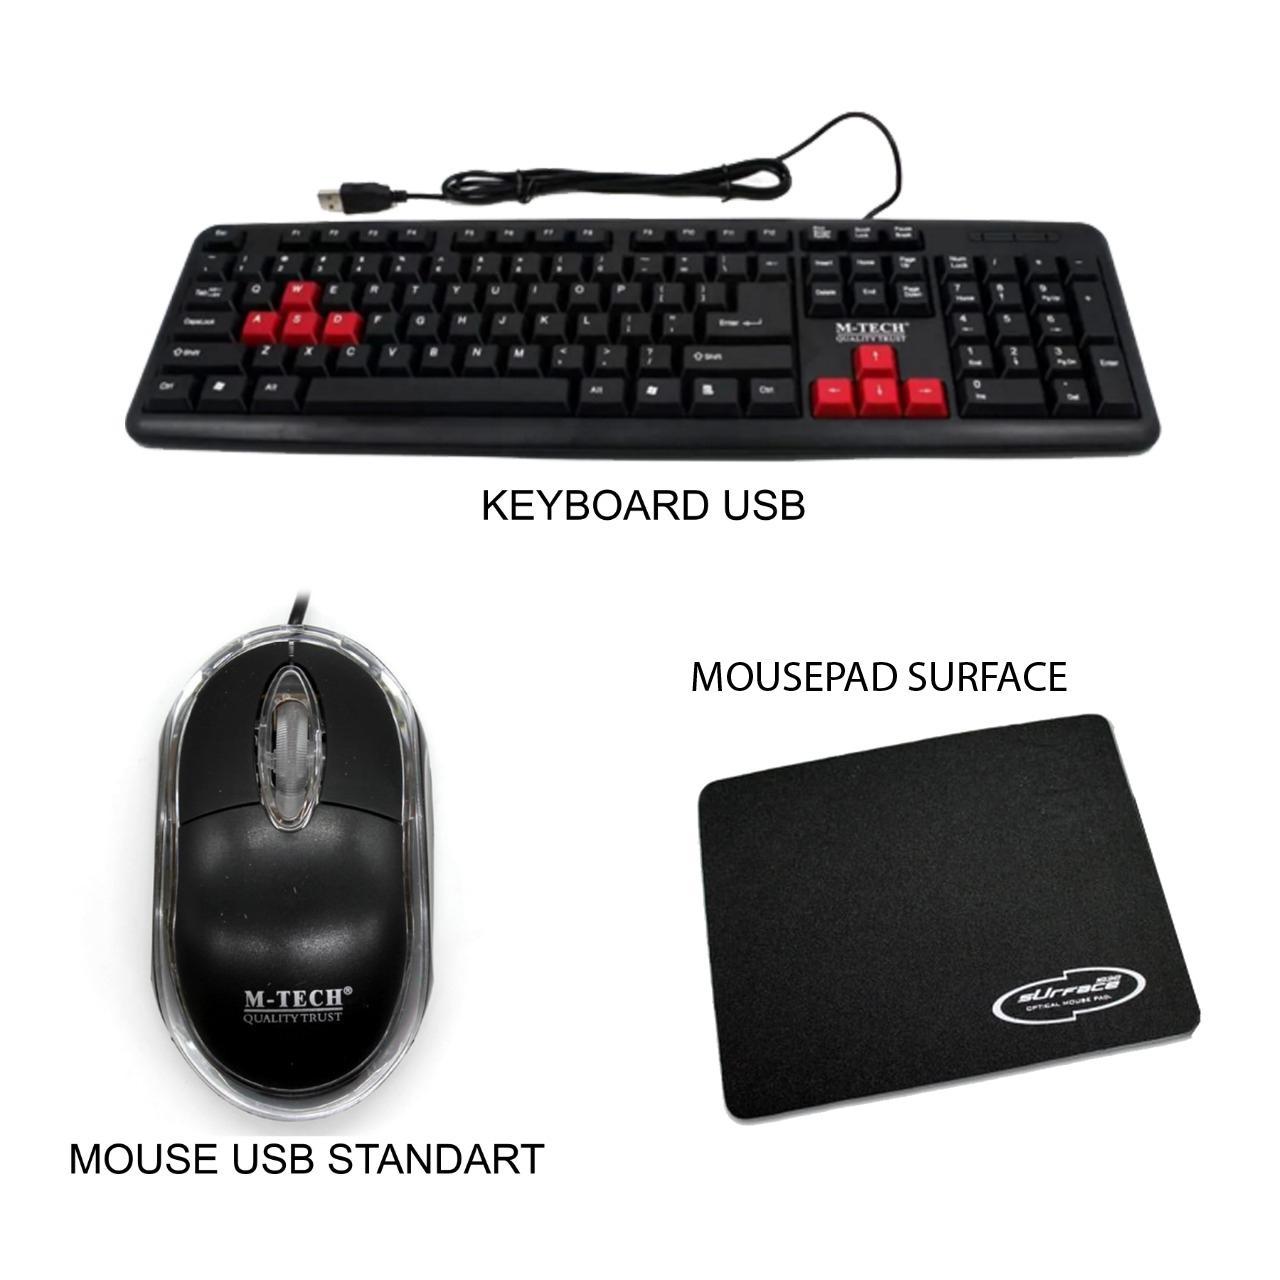 Keyboard Usb For Pc Komputer Laptop Paket Murah By Best Elektronik & It.